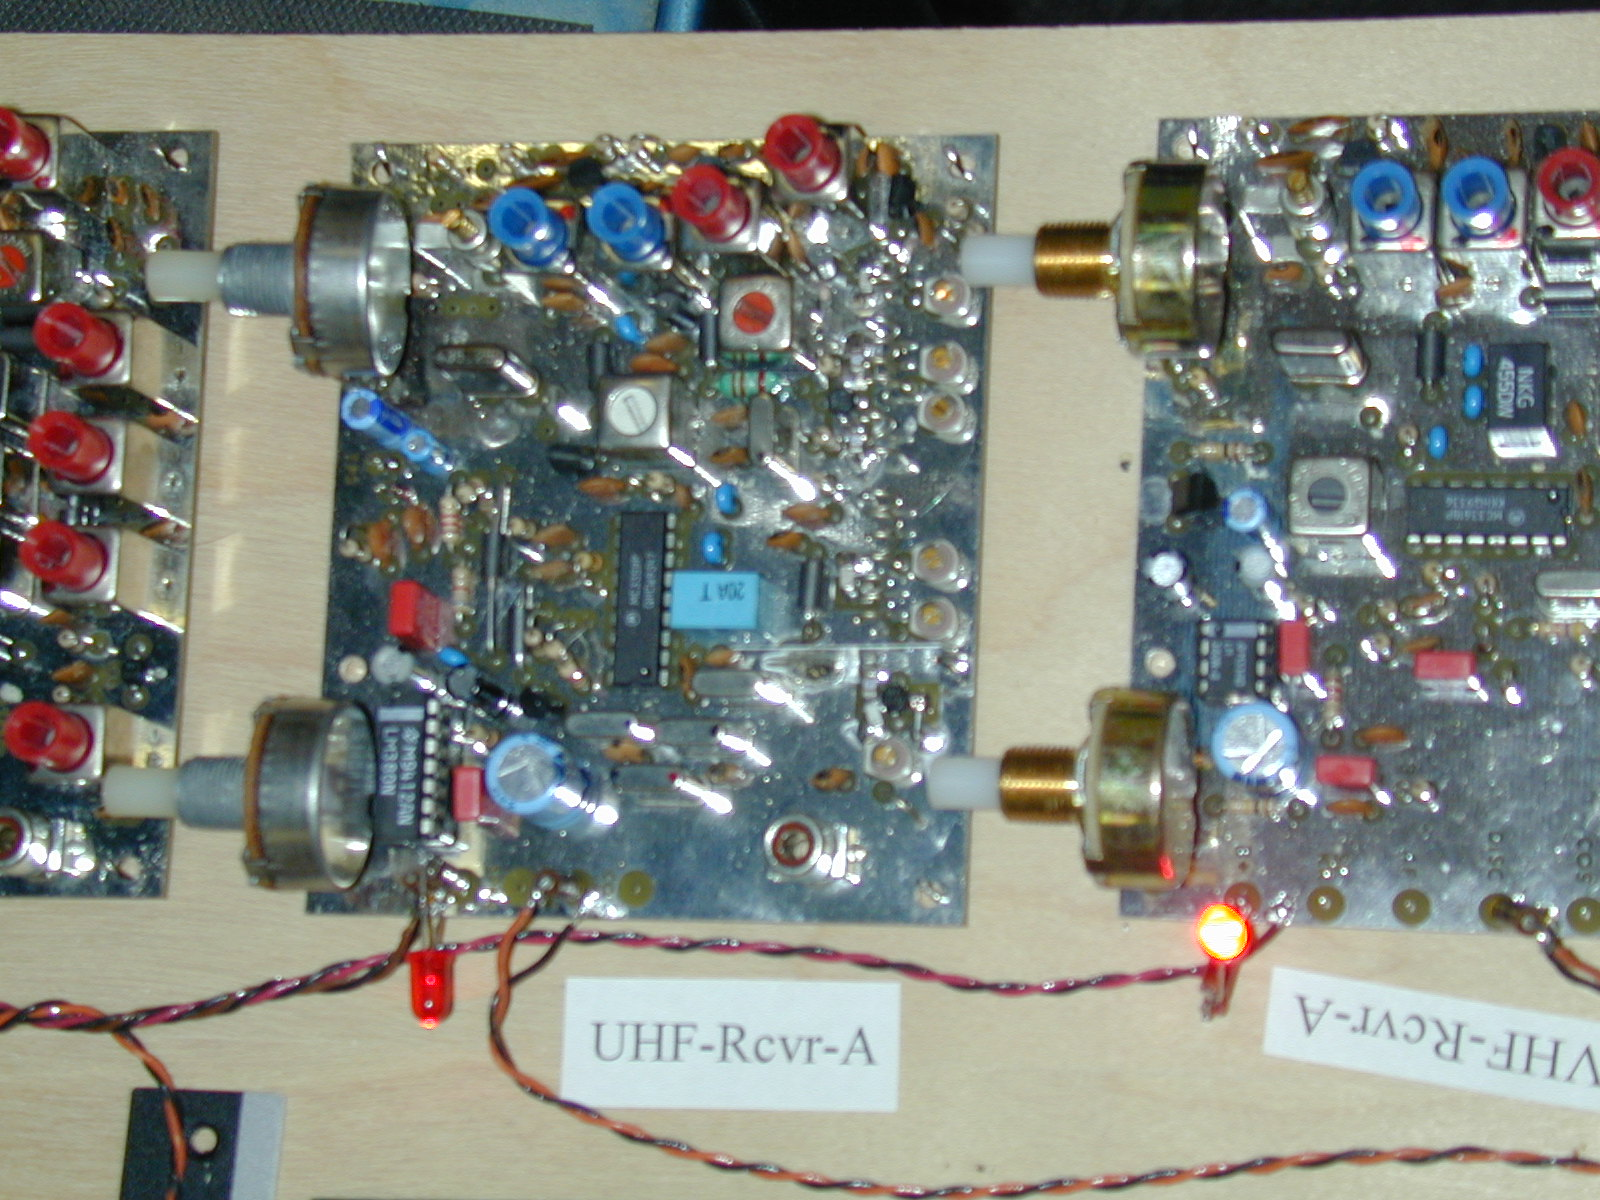 ... KPC-9612 Sixteen Channel Telemetry Circuit ...